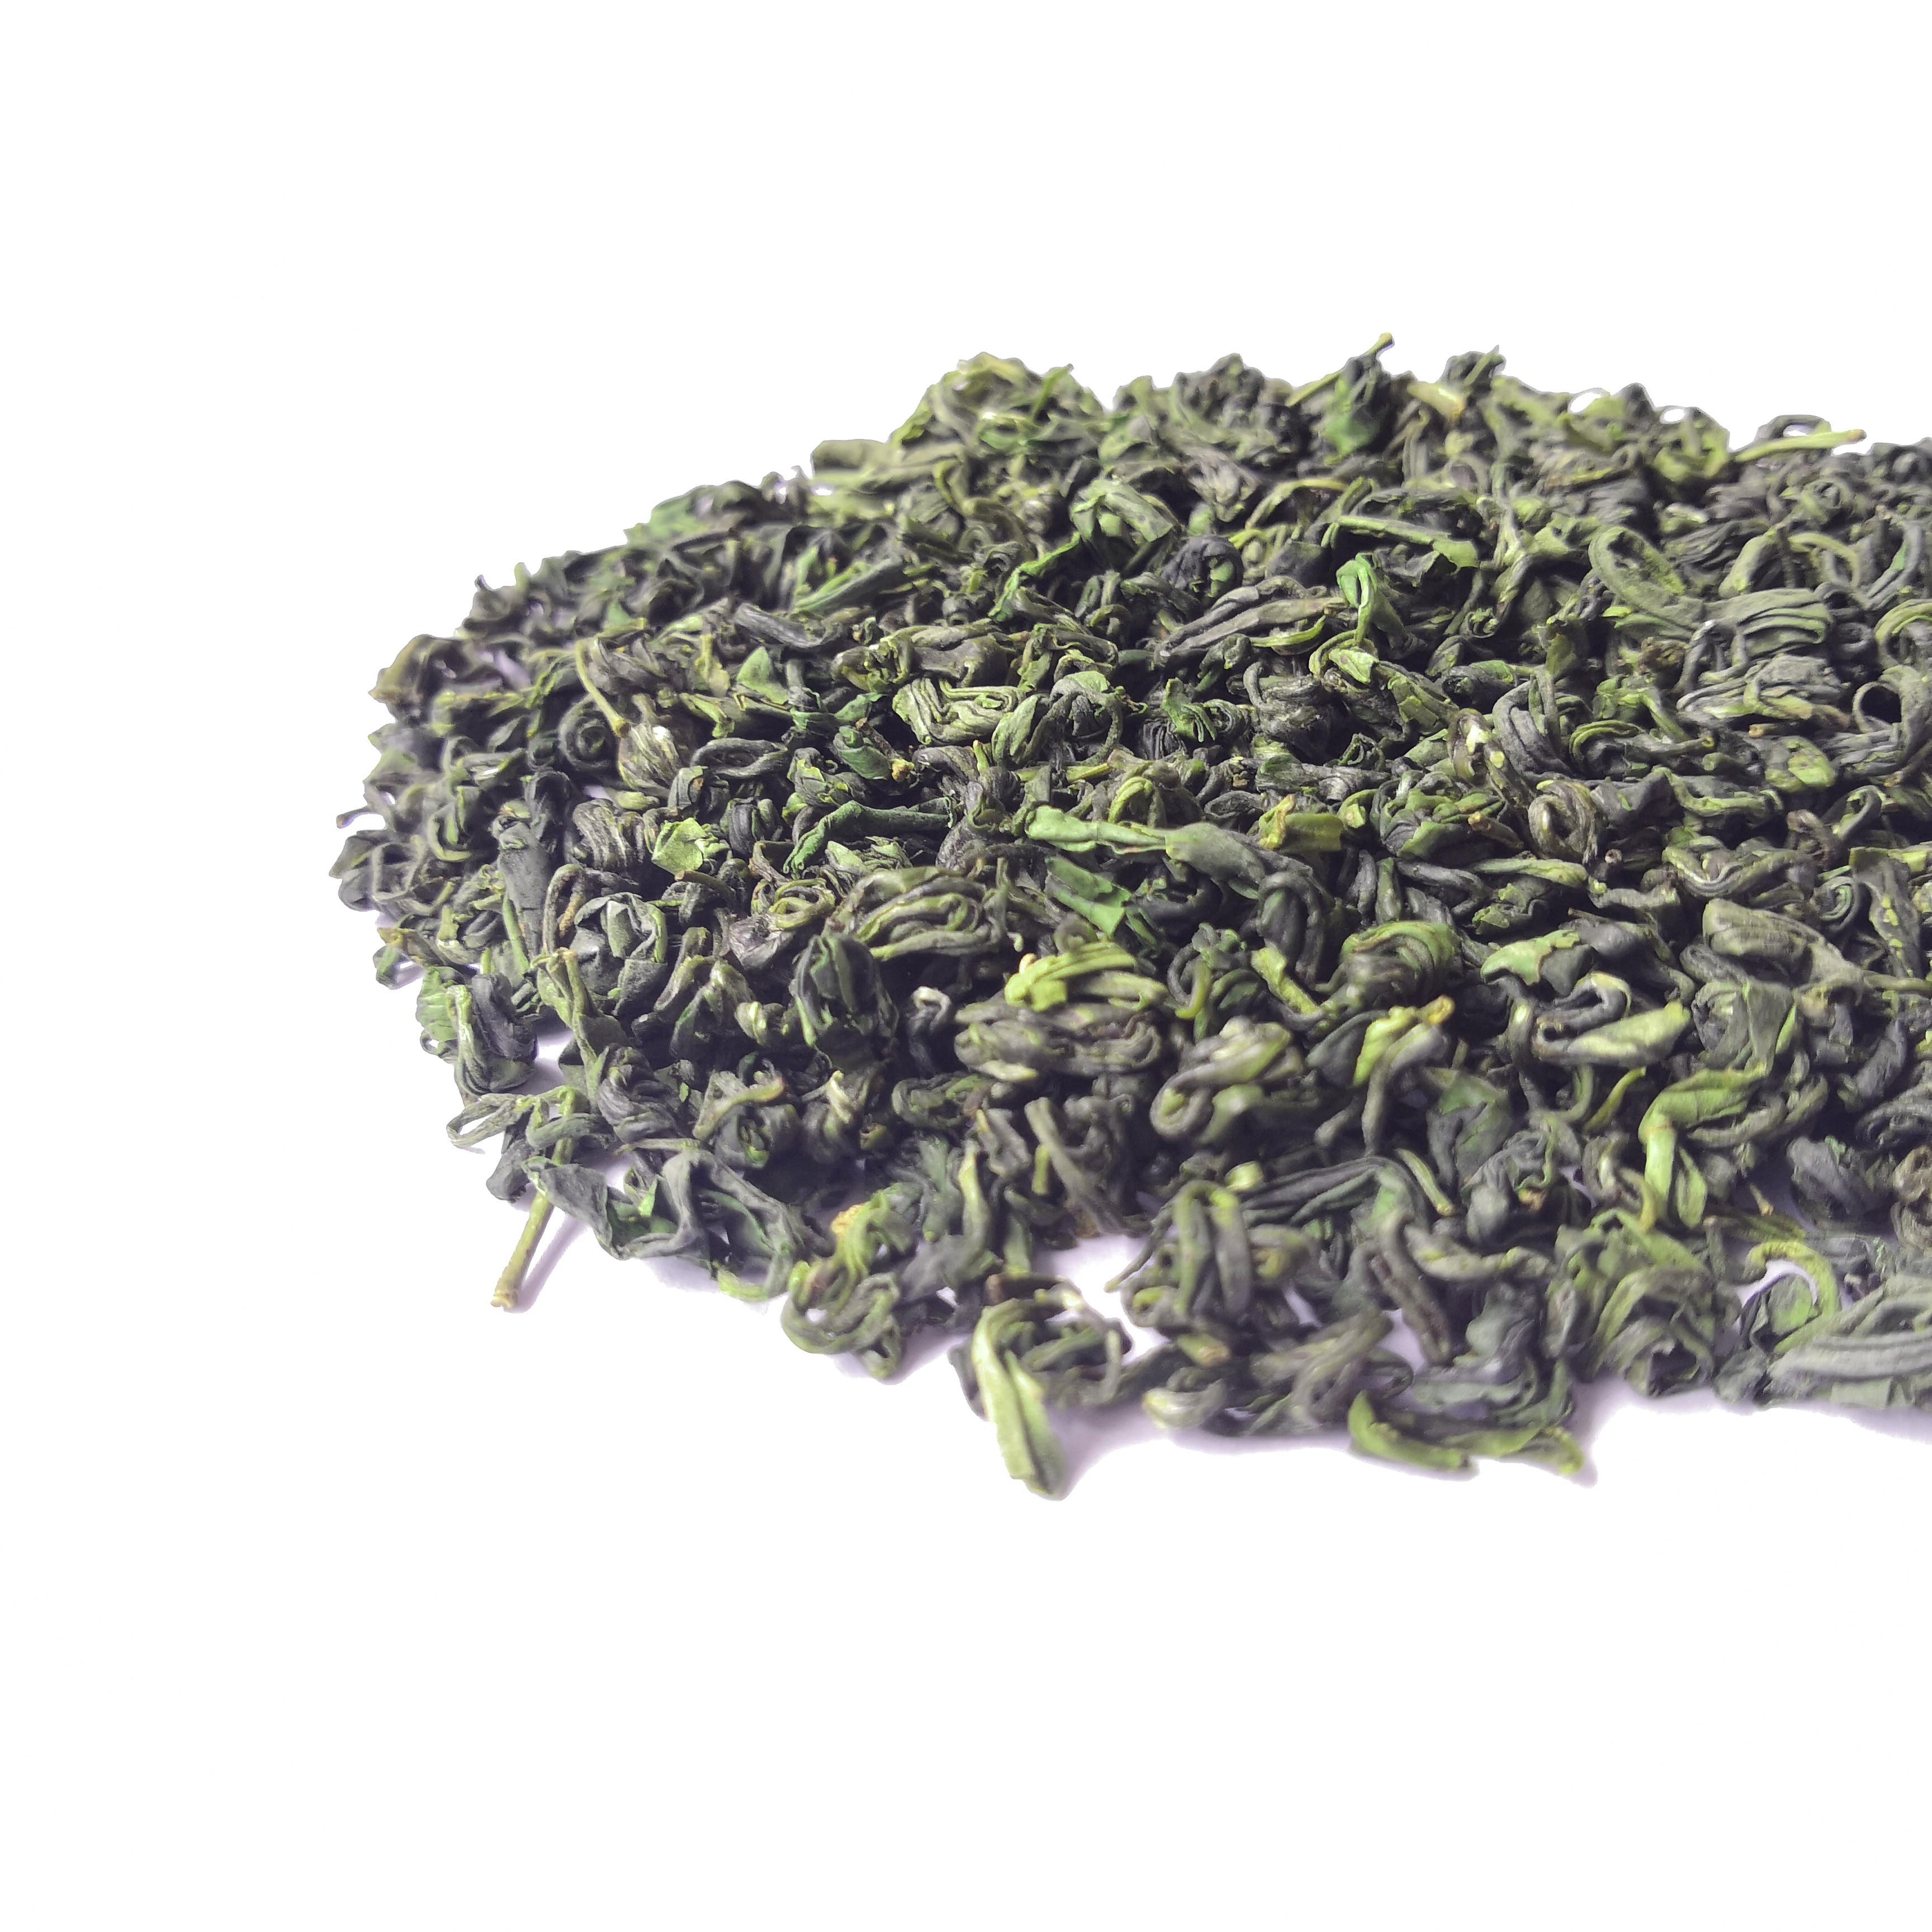 Top quality China factory supply green tea China special green tea Huizhou Tunlv - 4uTea | 4uTea.com